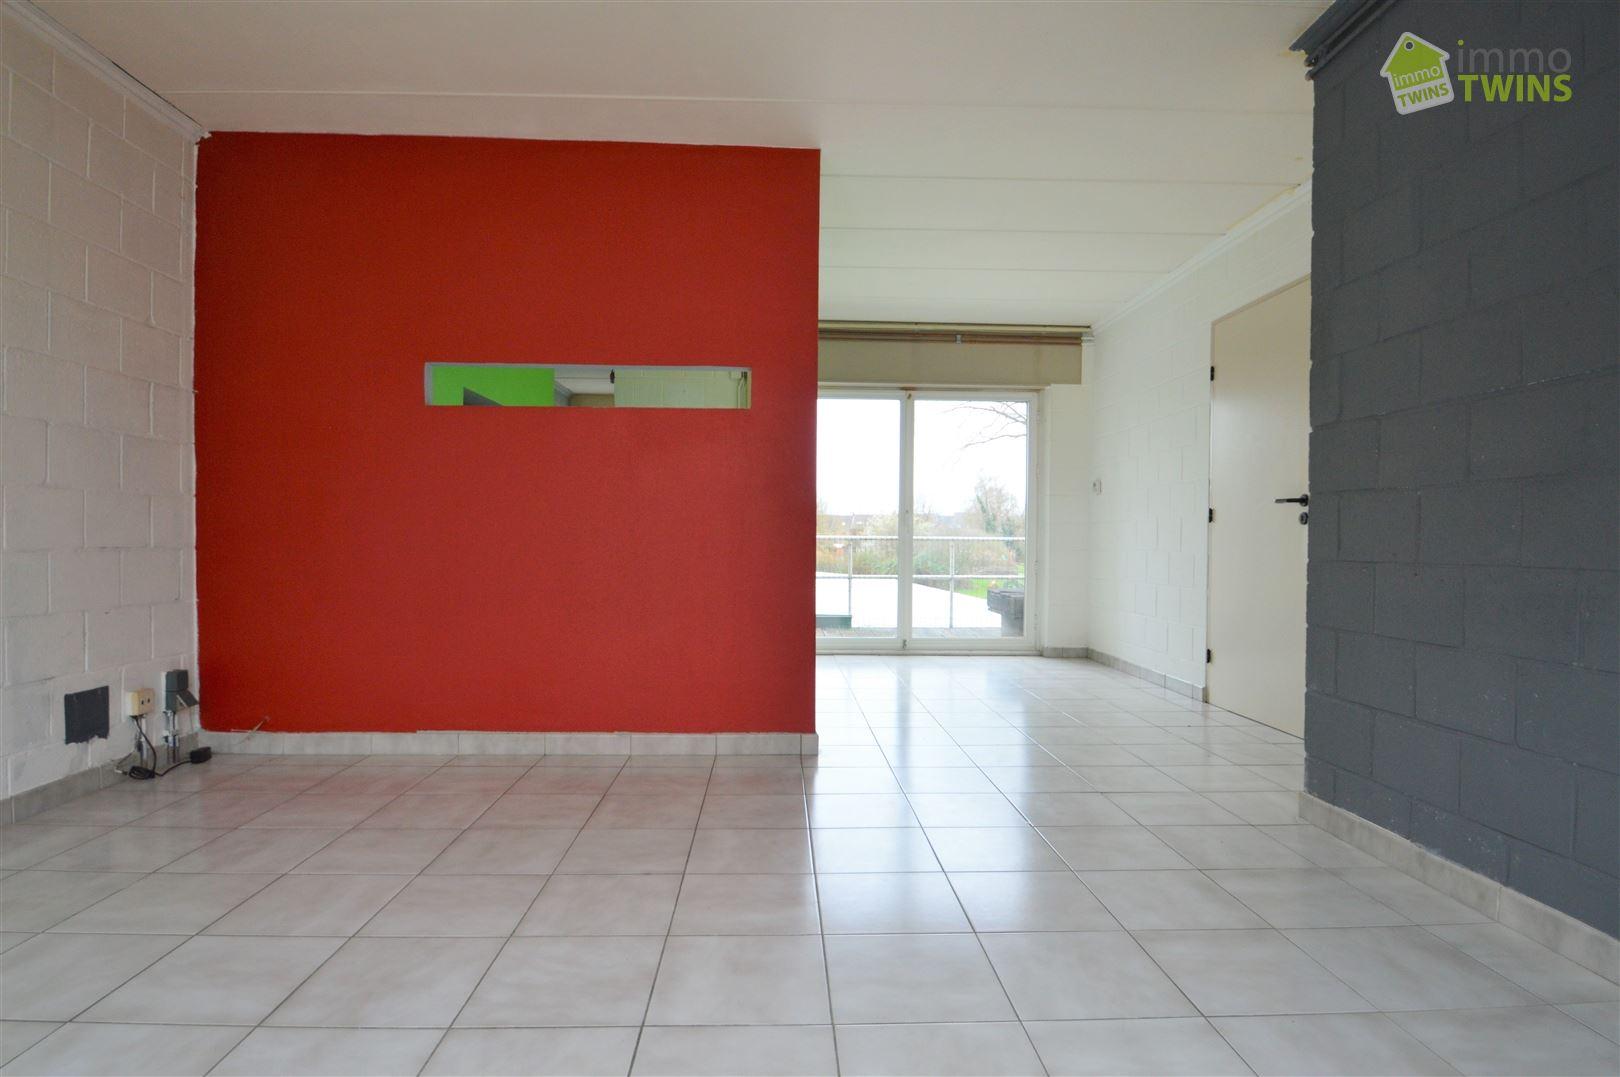 Foto 3 : Appartement te 9200 SINT-GILLIS-DENDERMONDE (België) - Prijs € 535